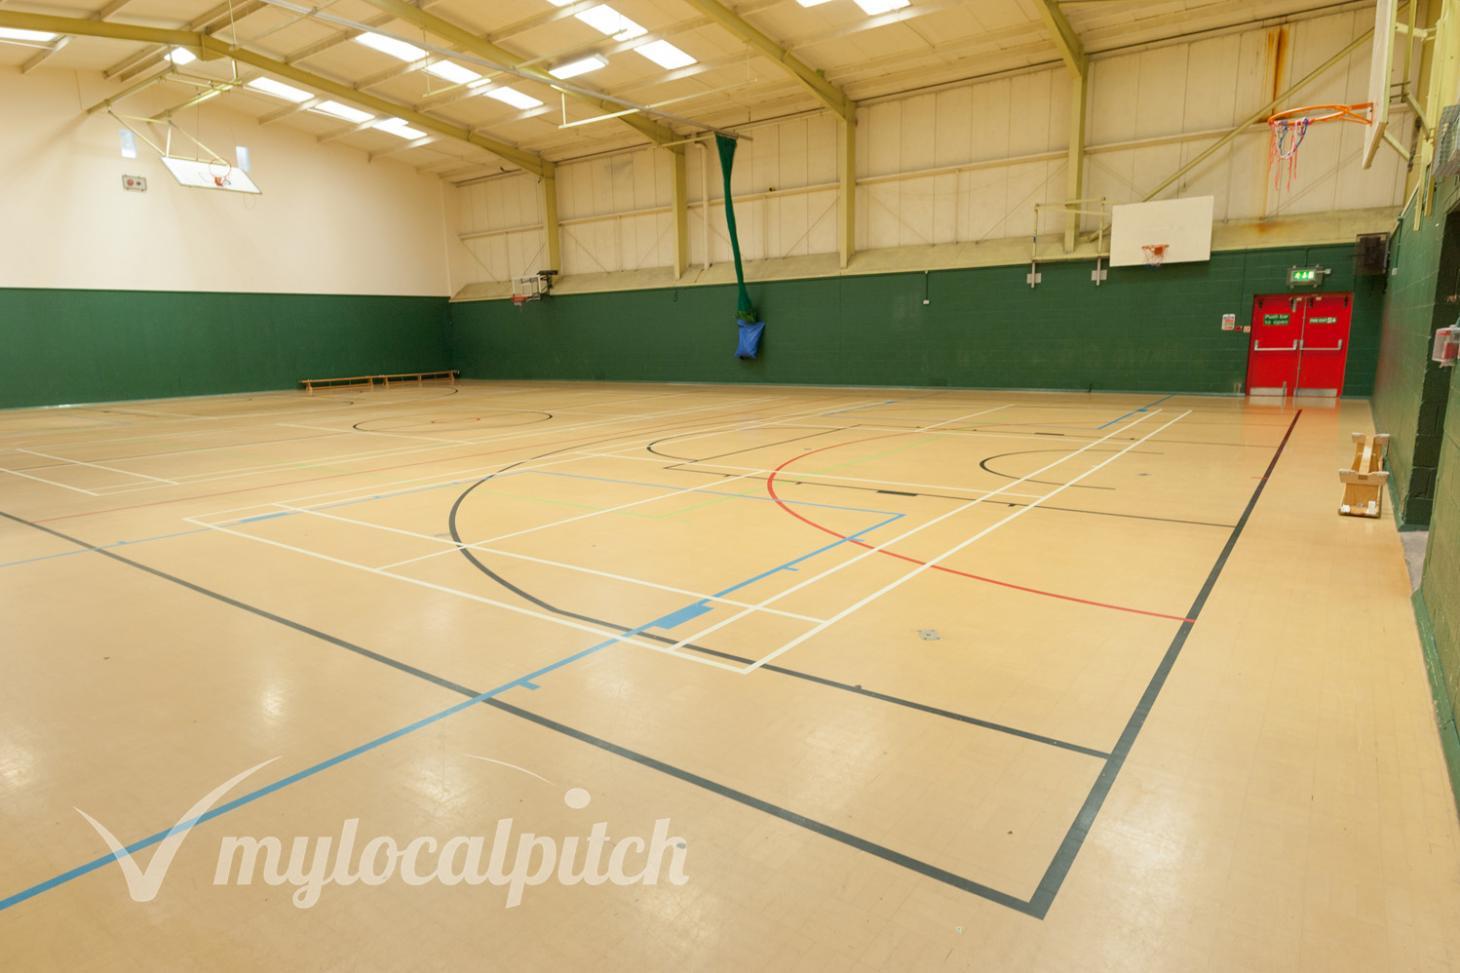 Swinton and Pendlebury Leisure Centre Indoor netball court